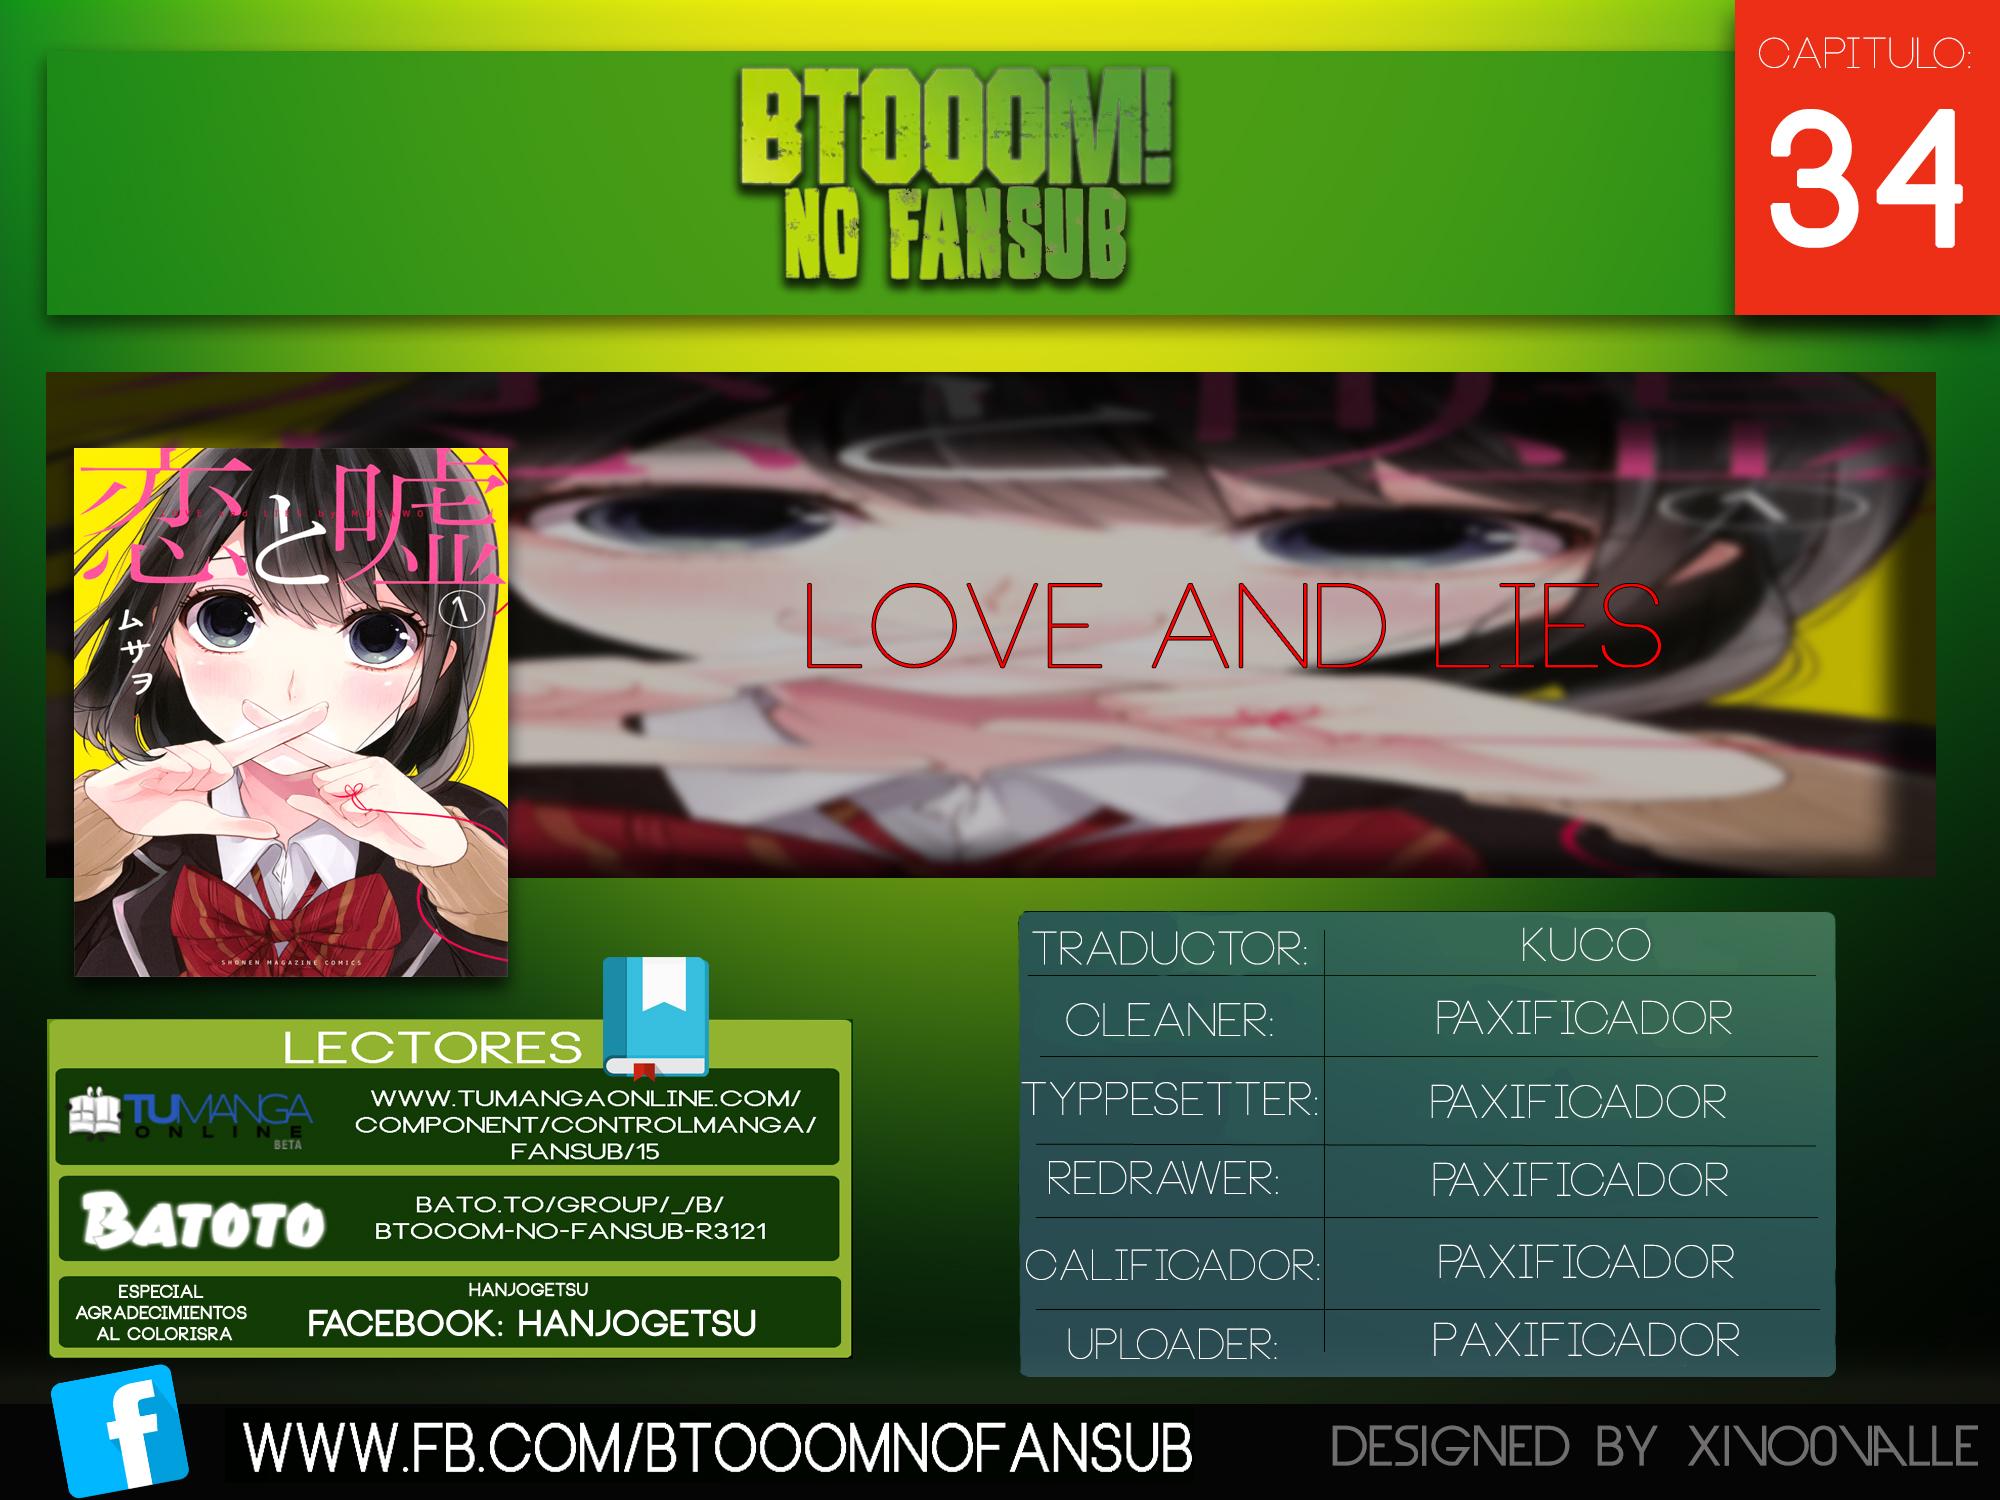 http://c5.ninemanga.com/es_manga/14/14734/361015/c4536001673379765300886594b6b485.jpg Page 1